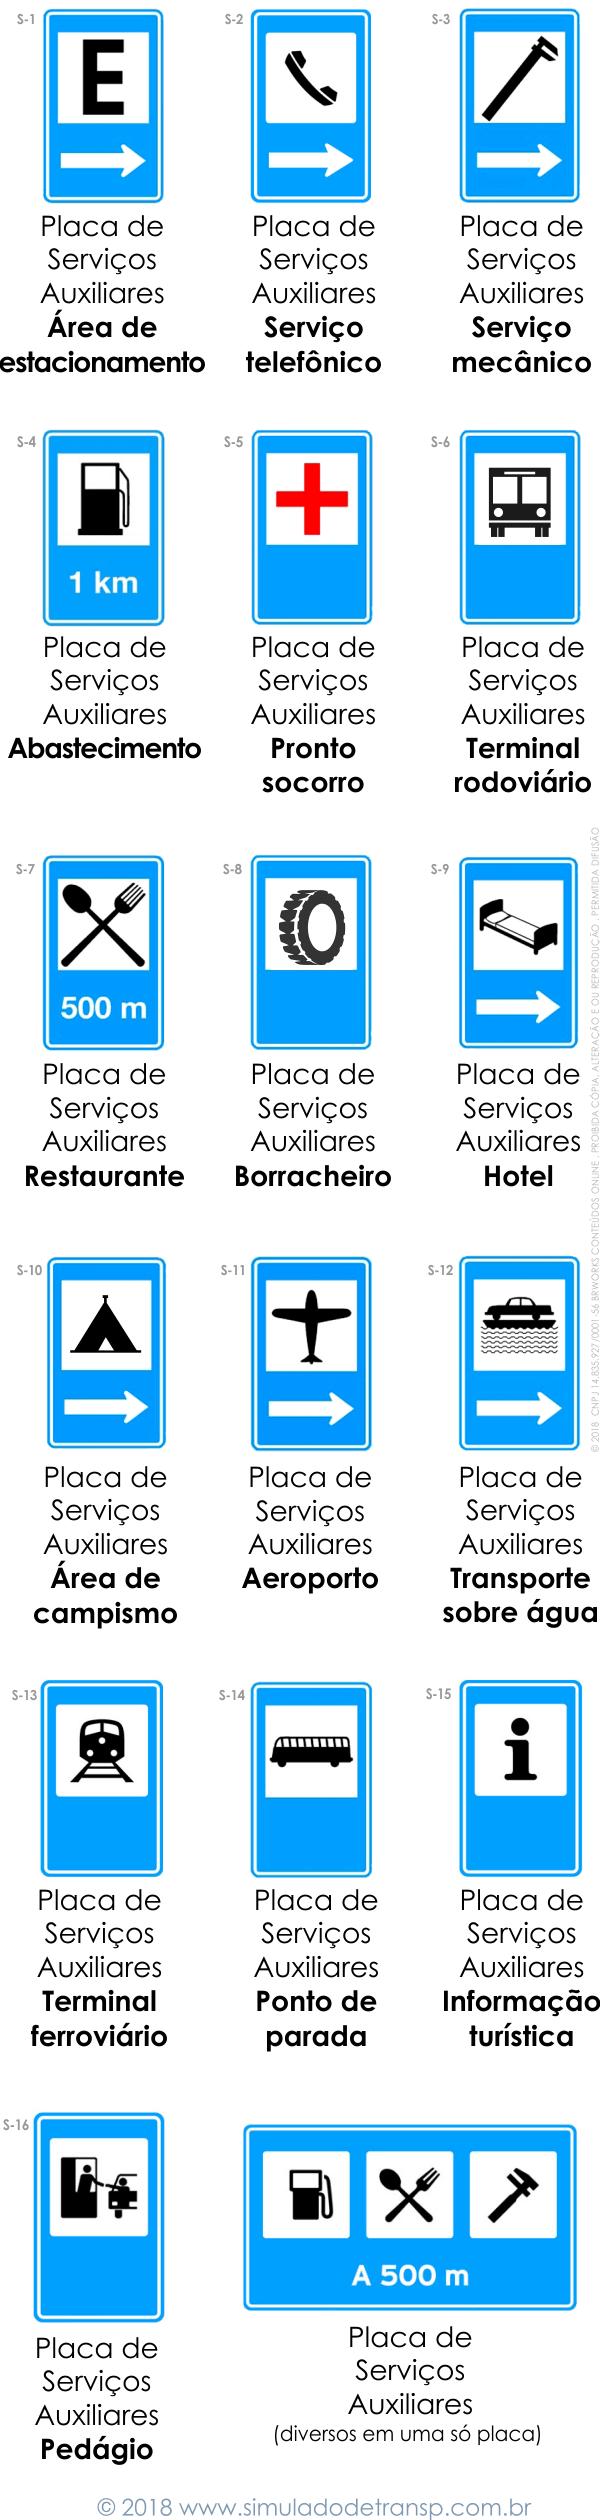 Placas auxiliares de serviço - 2019 mobile Simulado Detran SP